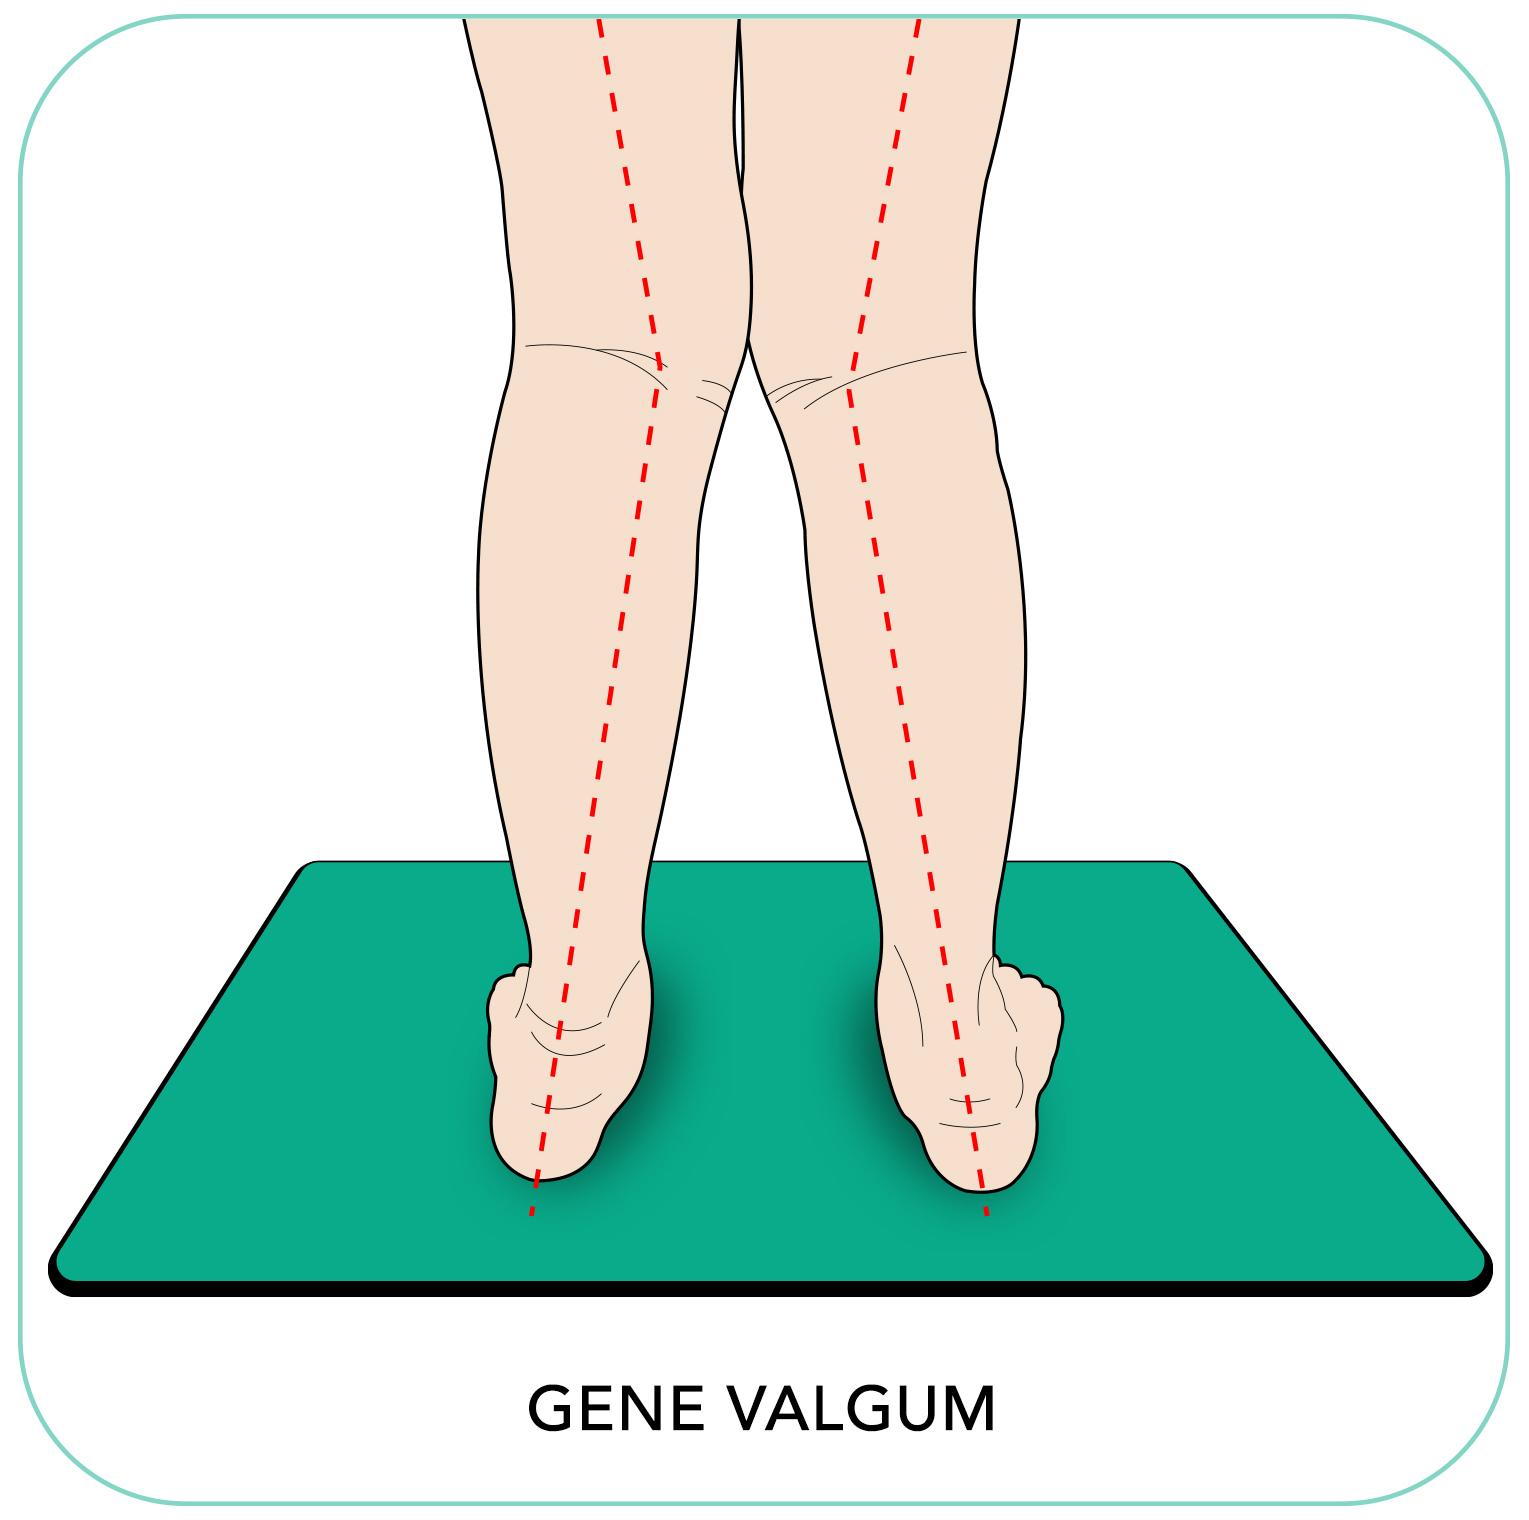 http://dubaipodiatry.com/wp-content/uploads/2019/09/Gene-Valgum-2-2.jpg